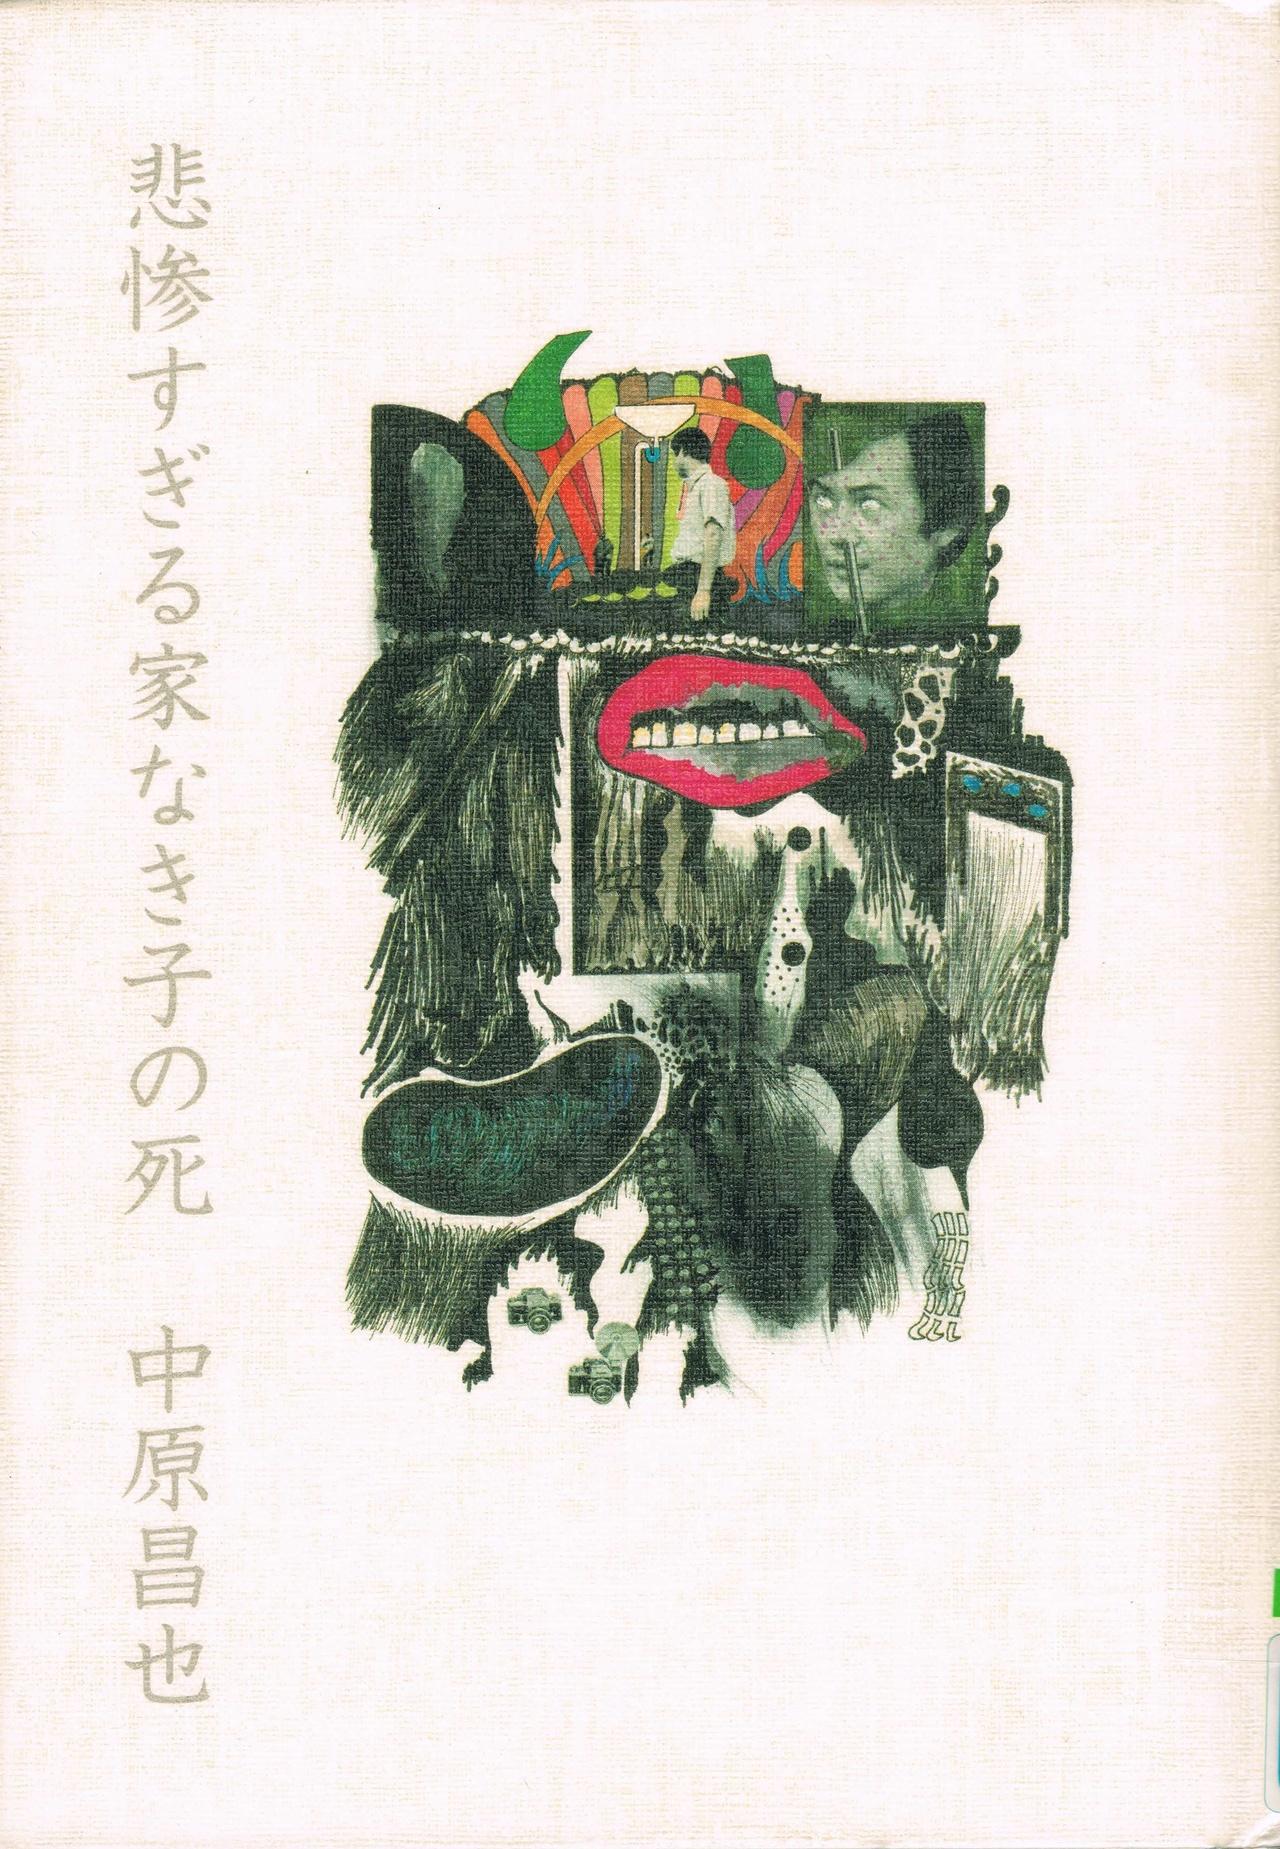 boooook :     「悲惨すぎる家なき子の死」 中原昌也 河出書房新社 読了。